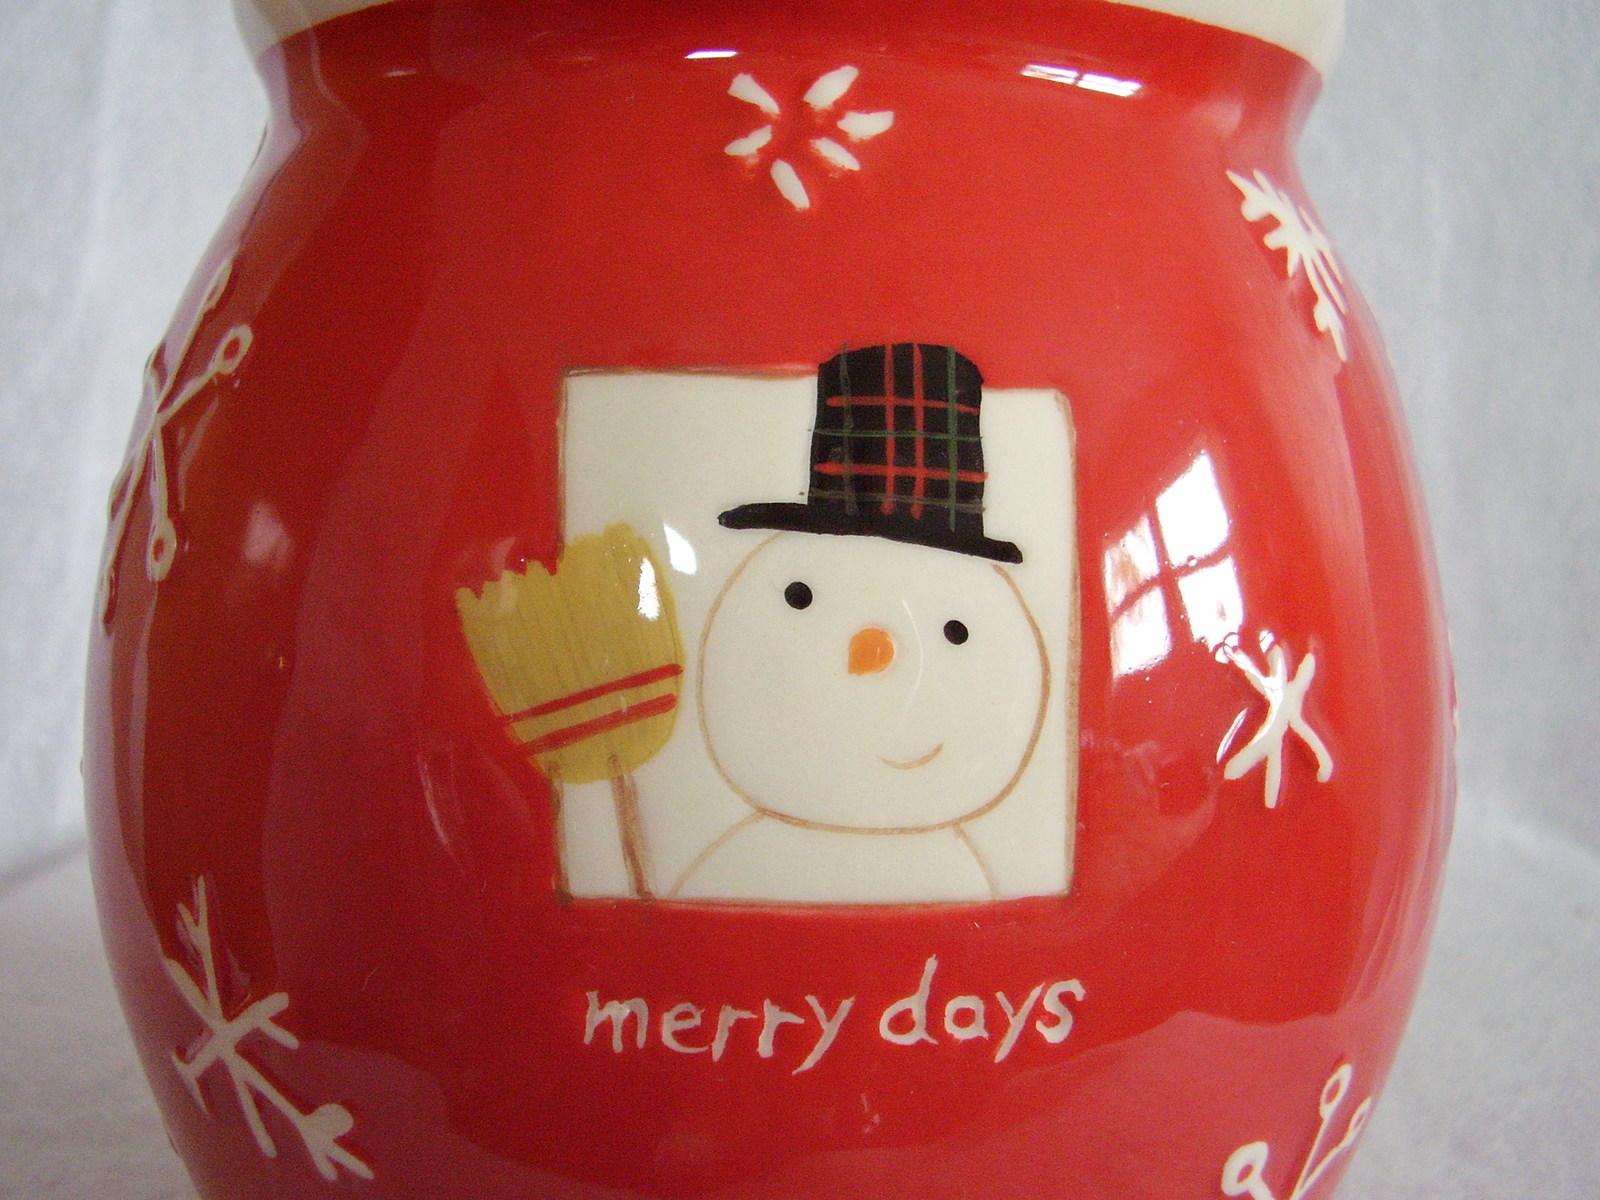 Hallmark Christmas Cookie Treat Jar Merry Days Snowman Snowflakes Jingle Bell image 4